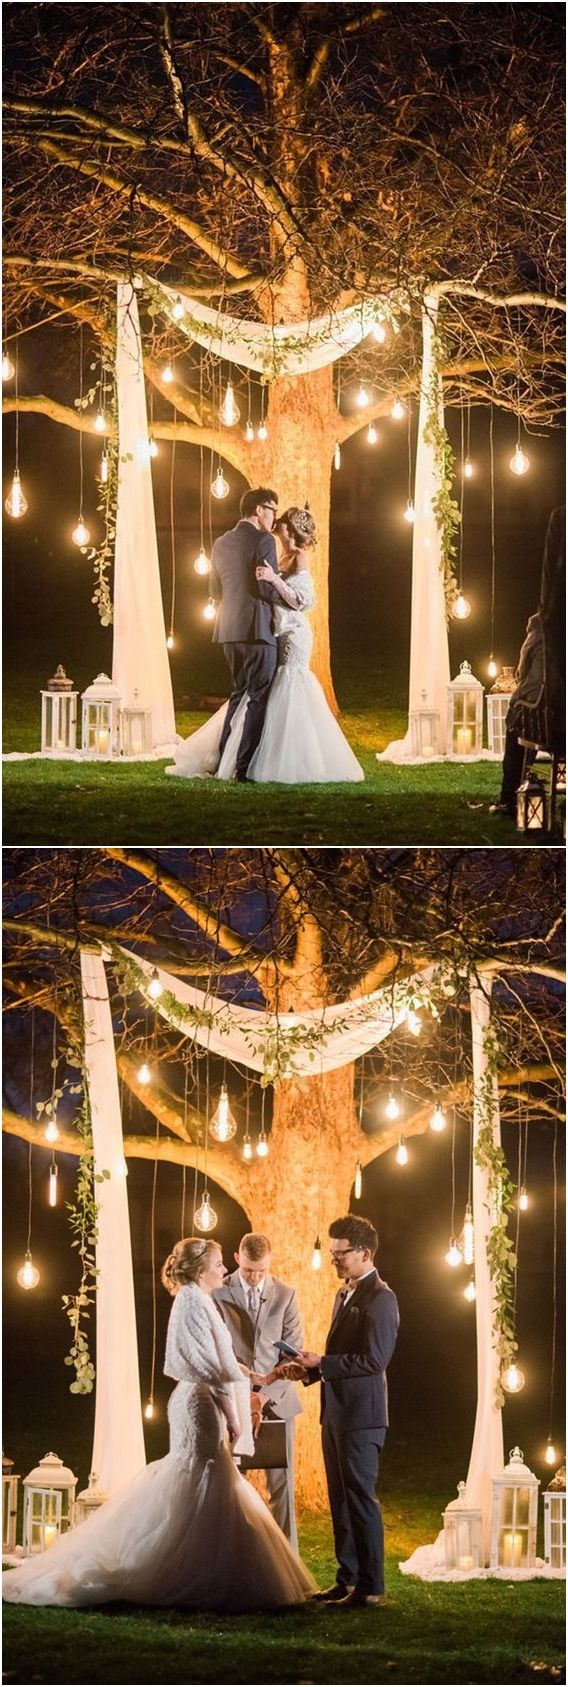 Top 20 Wedding Tree Backdrops und Bögen